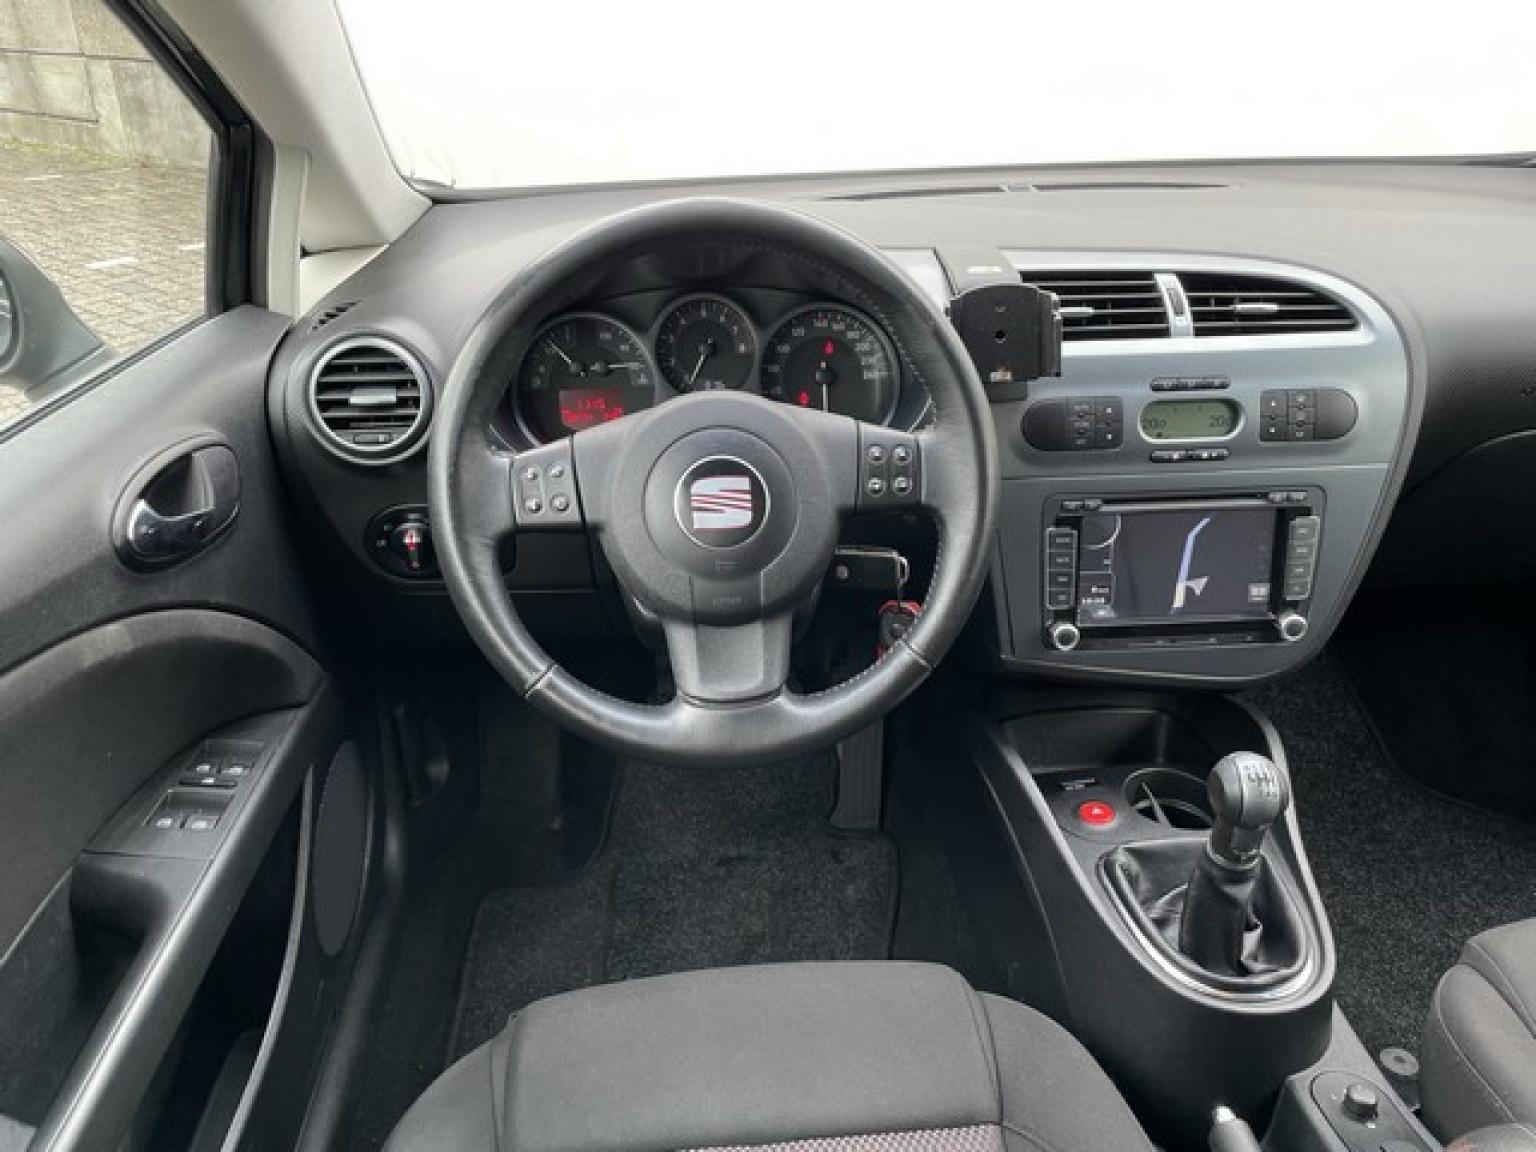 SEAT-Leon-8